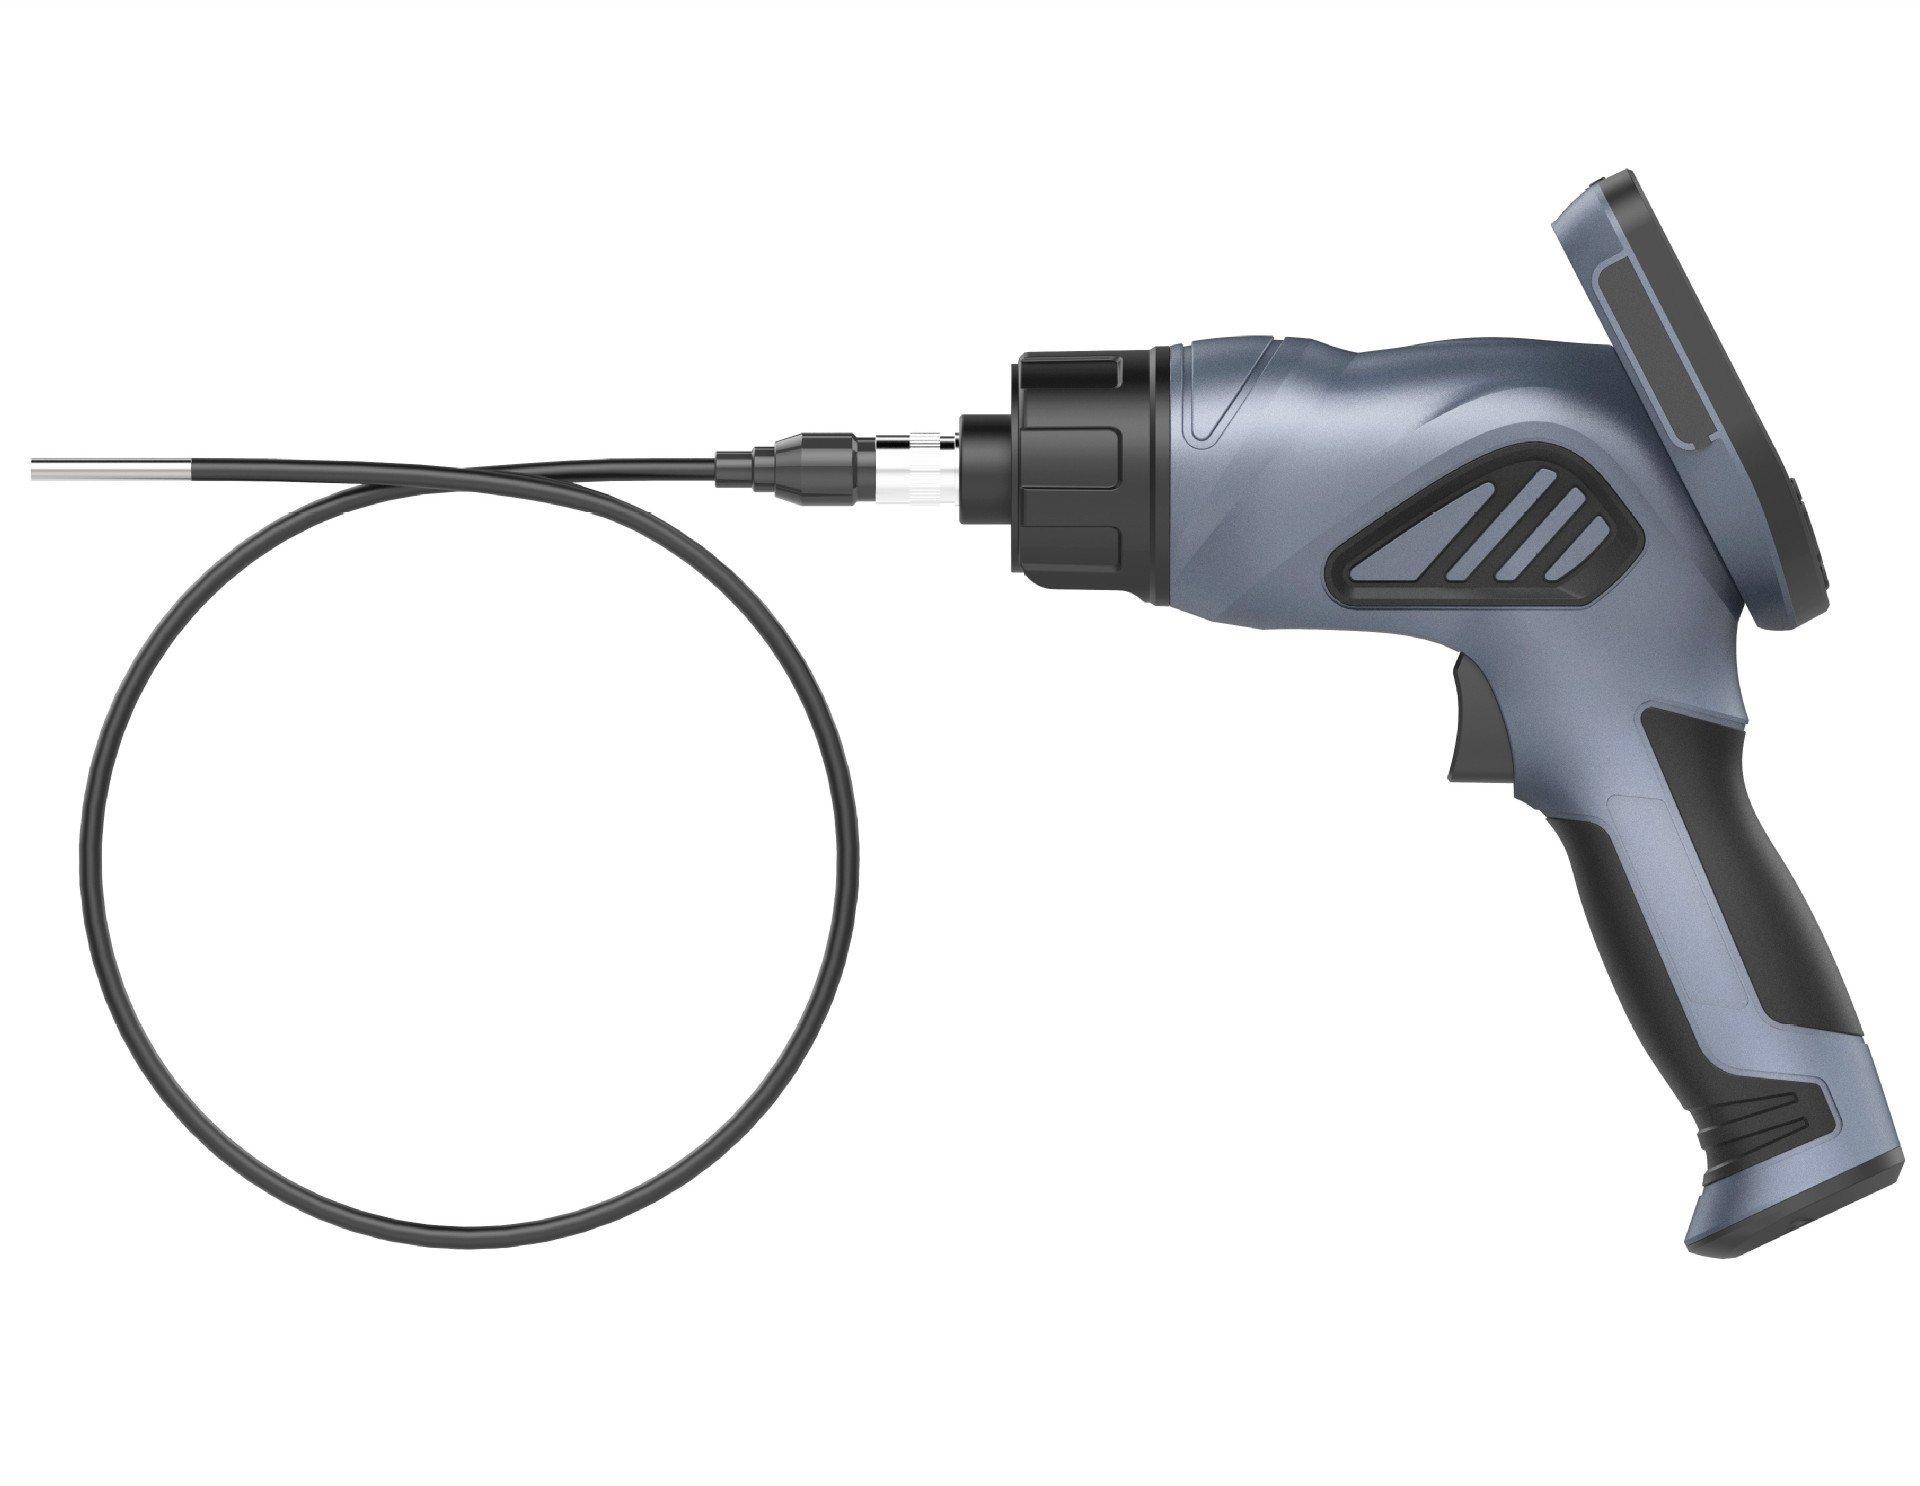 F508S temperature display with temperature control 45 million pixel car endoscope burner cleaning endoscope